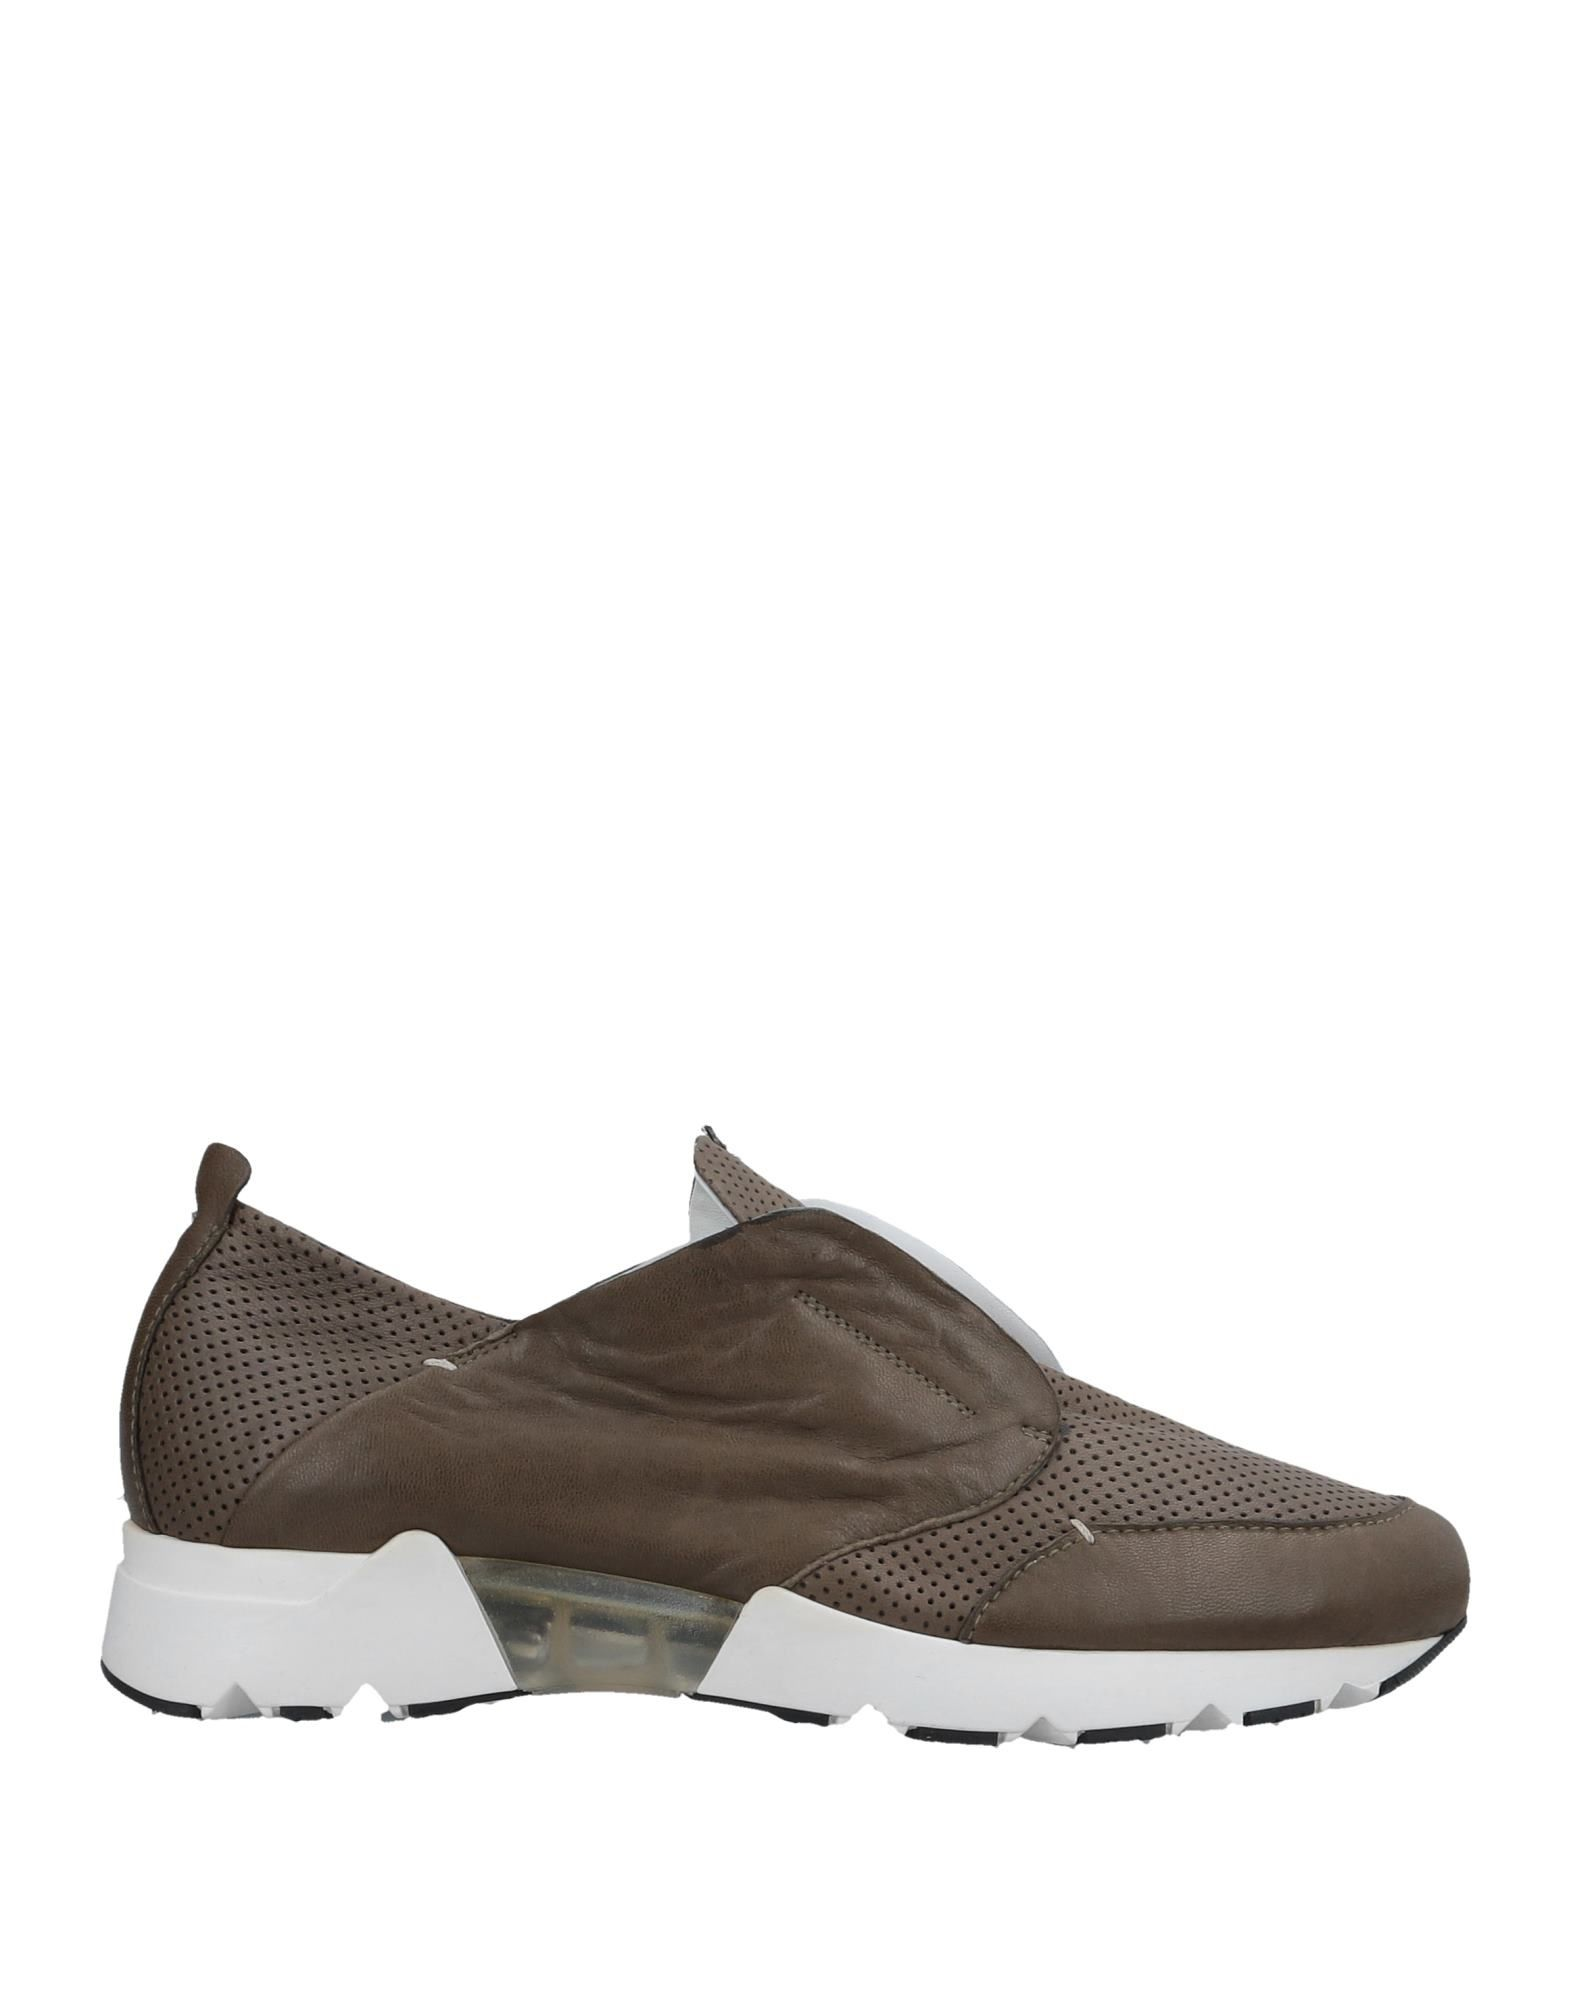 Rabatt Schuhe Henry Beguelin Sneakers Damen  11508957AQ